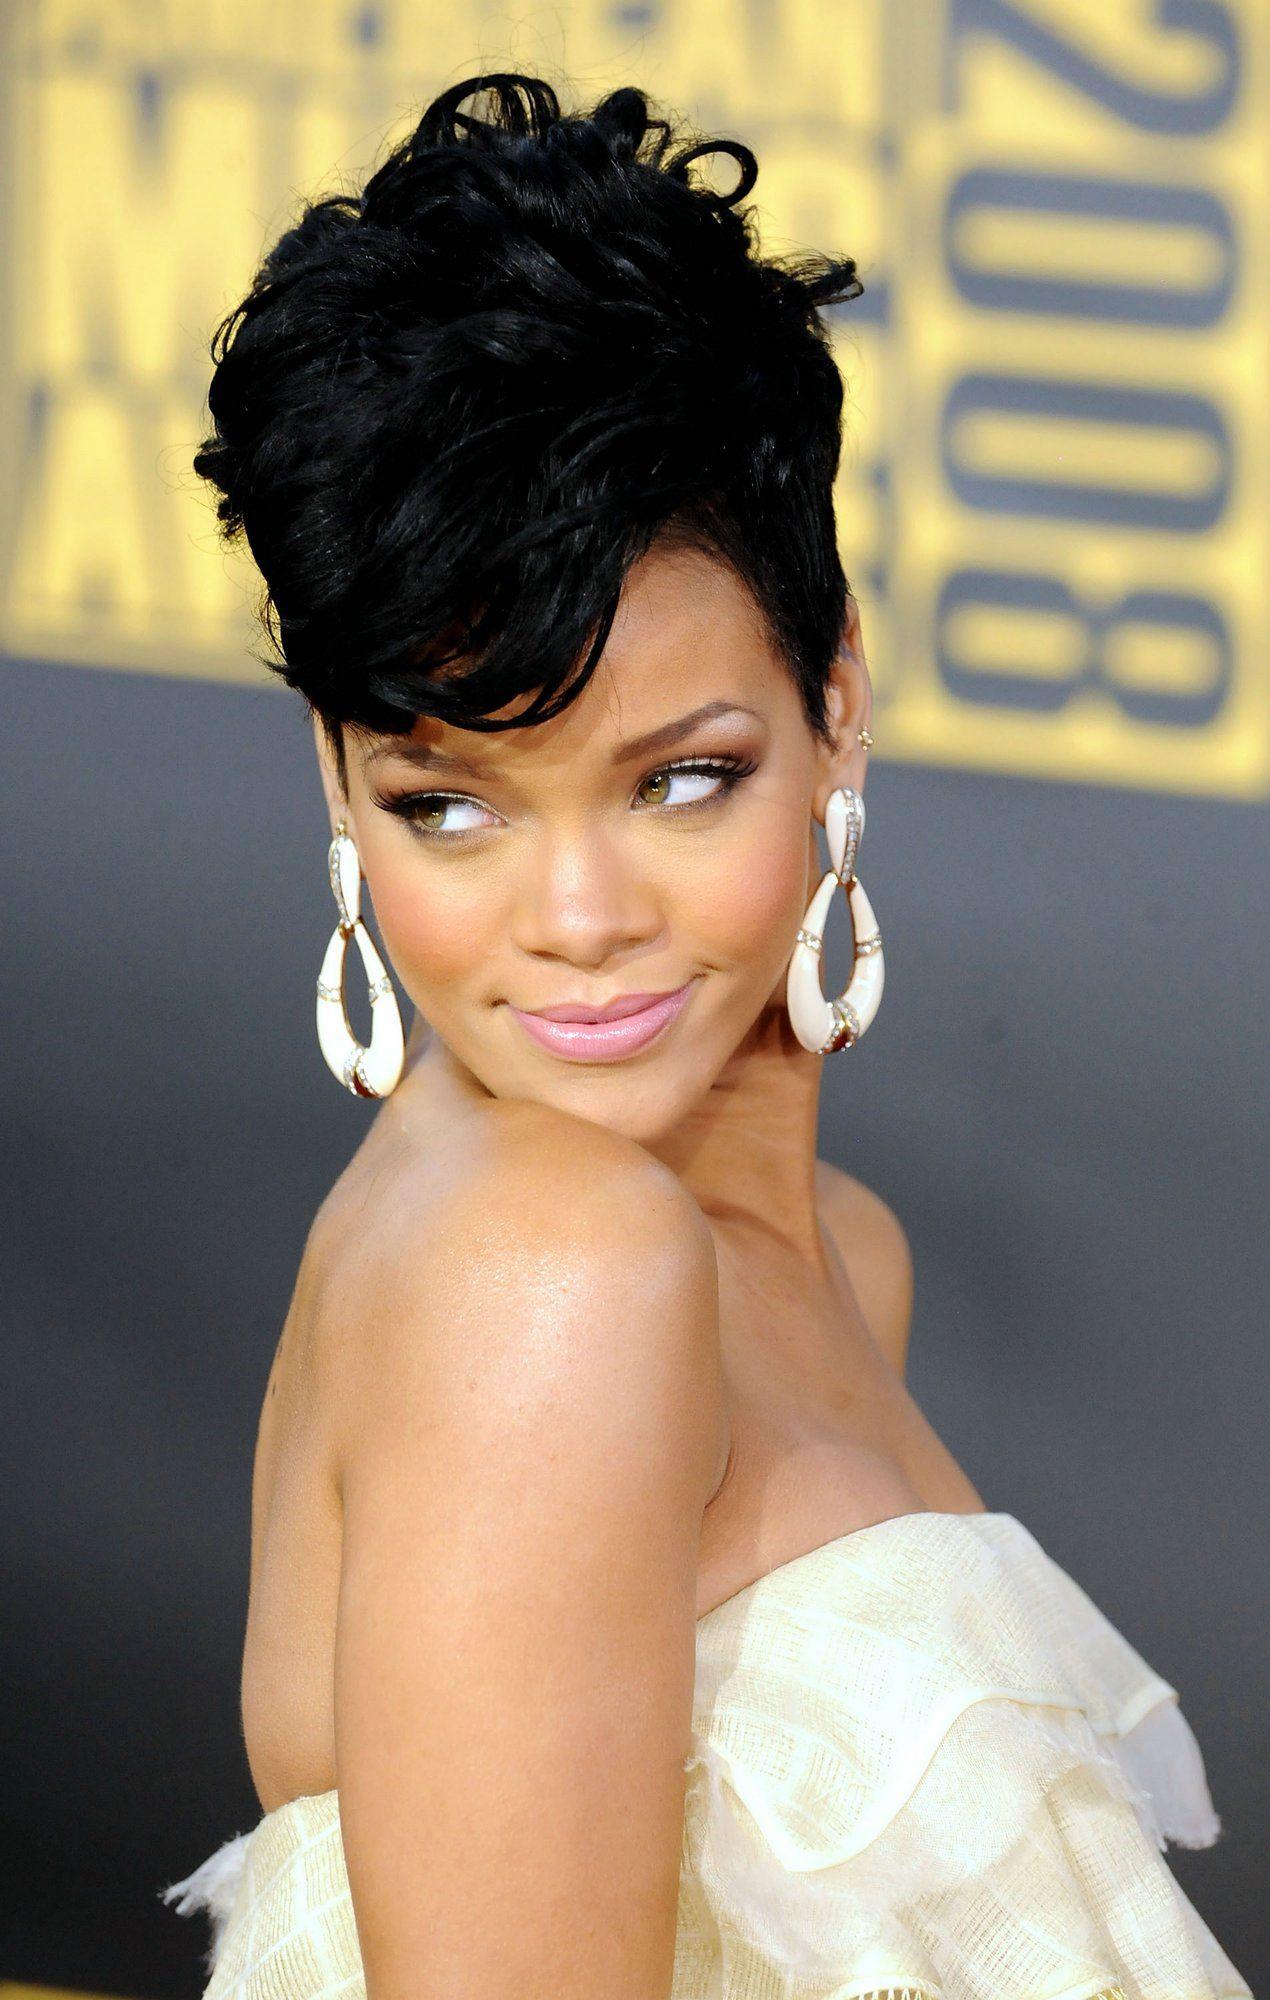 Pleasing 1000 Images About Lt3 Rihanna On Pinterest Rihanna Rihanna Short Hairstyles For Black Women Fulllsitofus